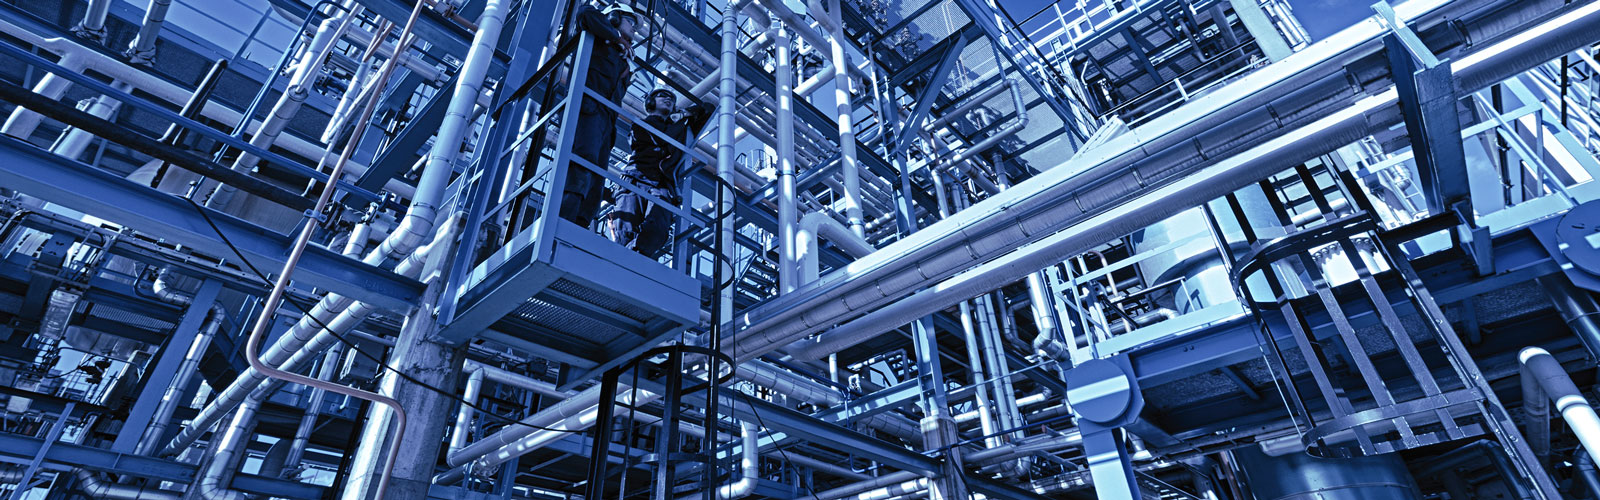 liquid process filtration slider